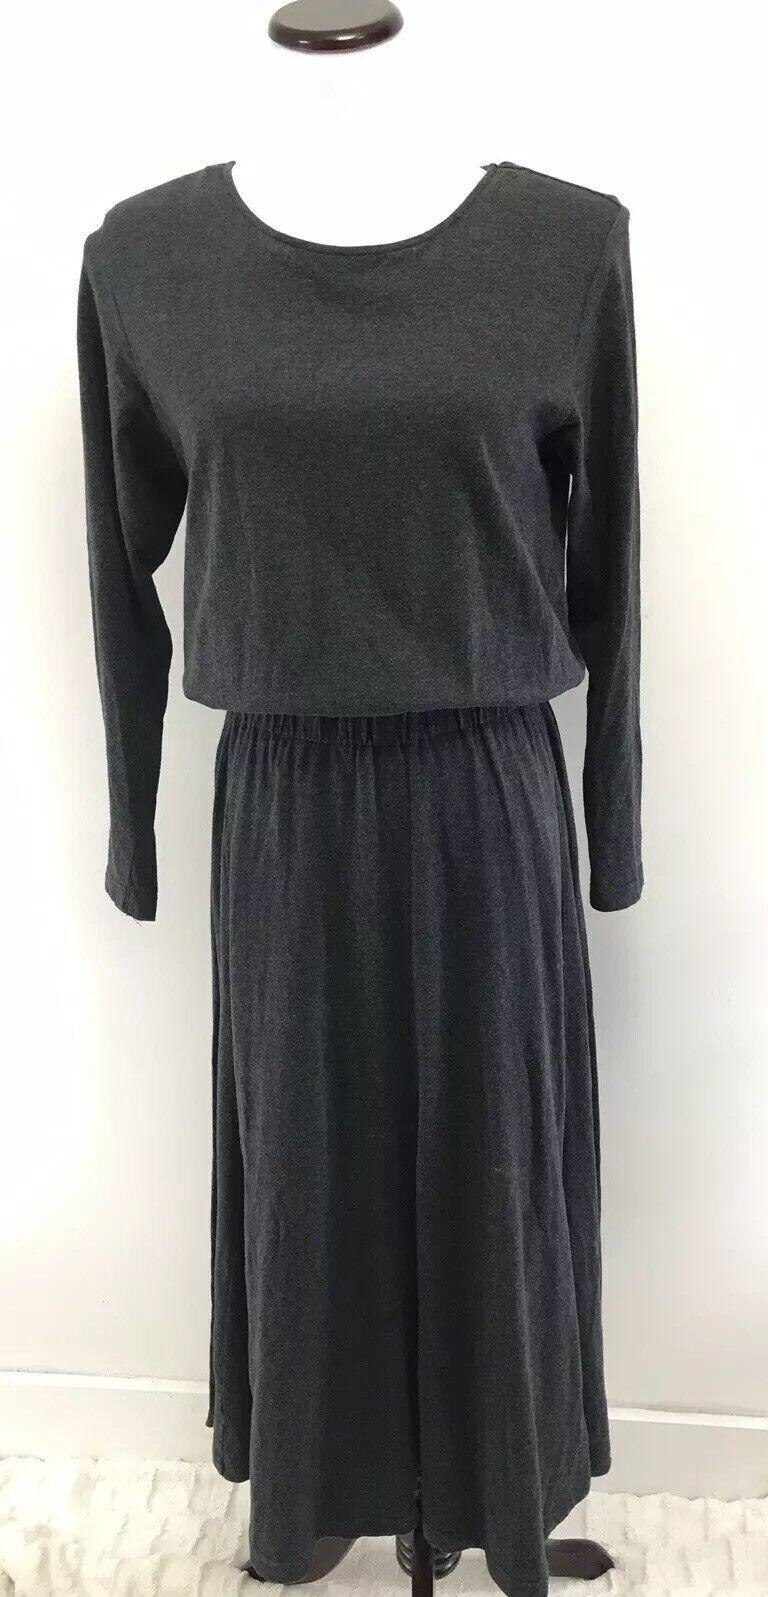 Vintage Laura Ashley Cotton Solid Grey Simple Maxi Long Dress